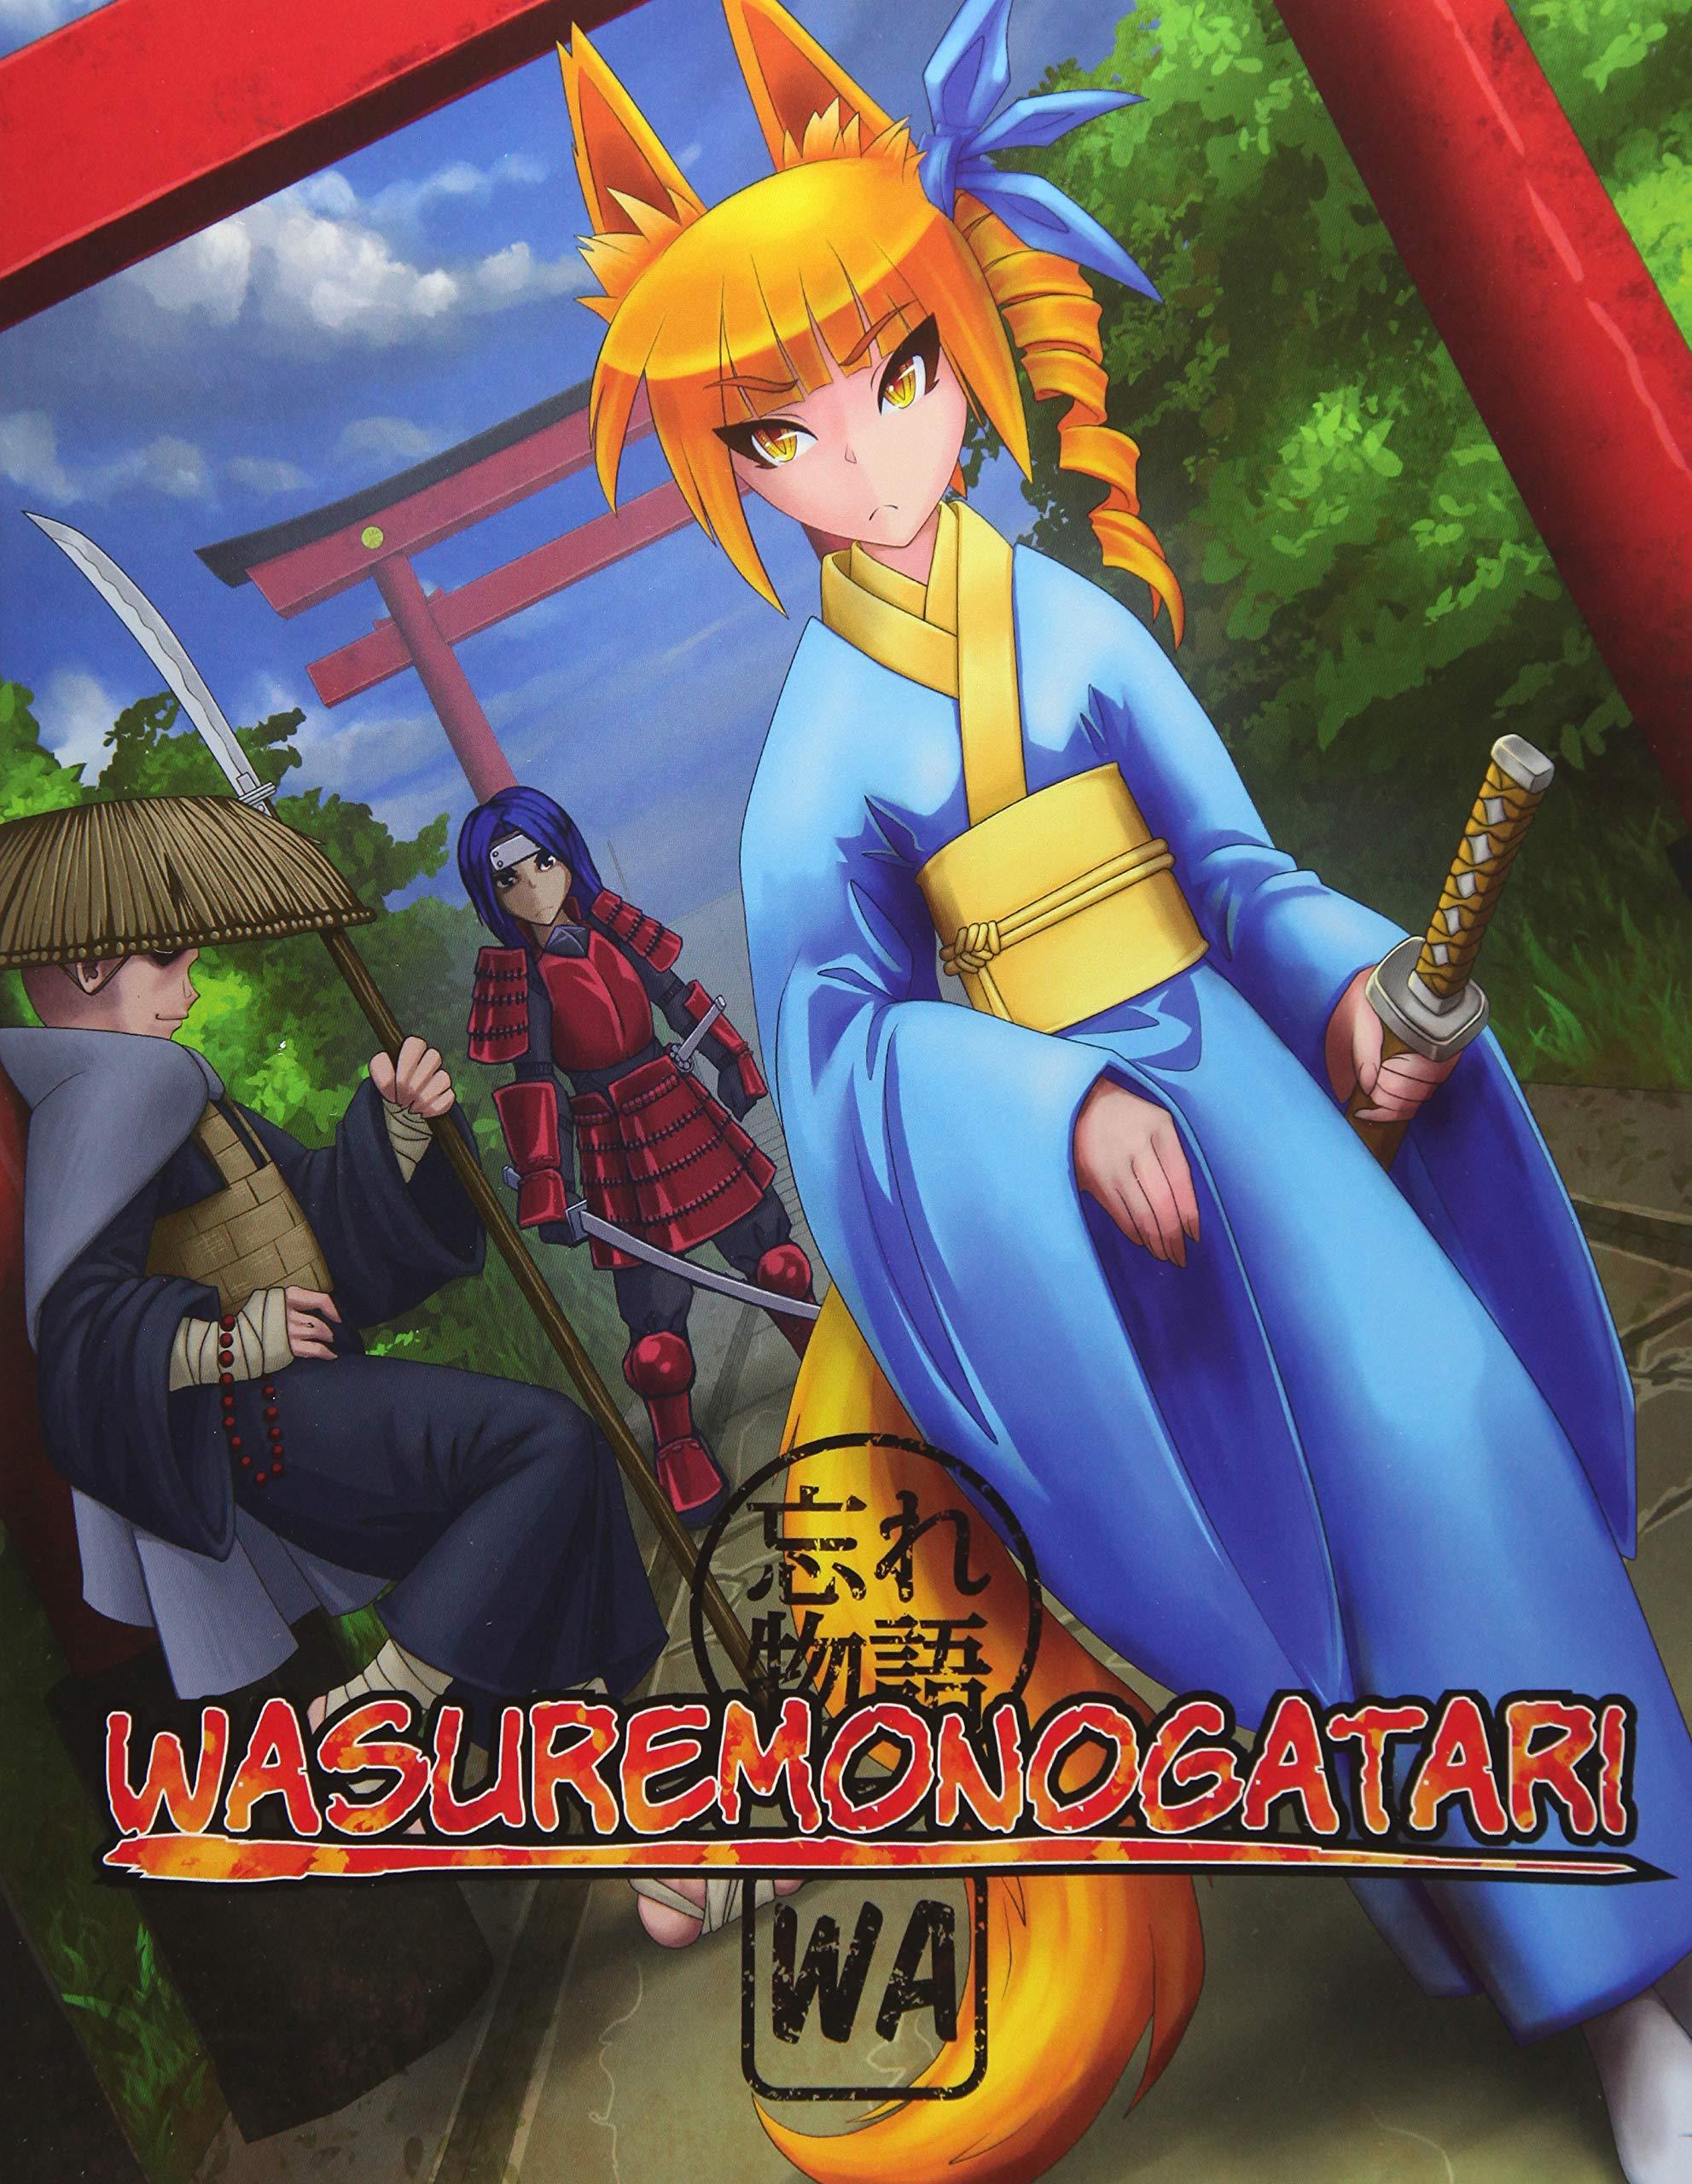 Wasuremonogatari color wa the anime manga rpg paperback august 5 2014